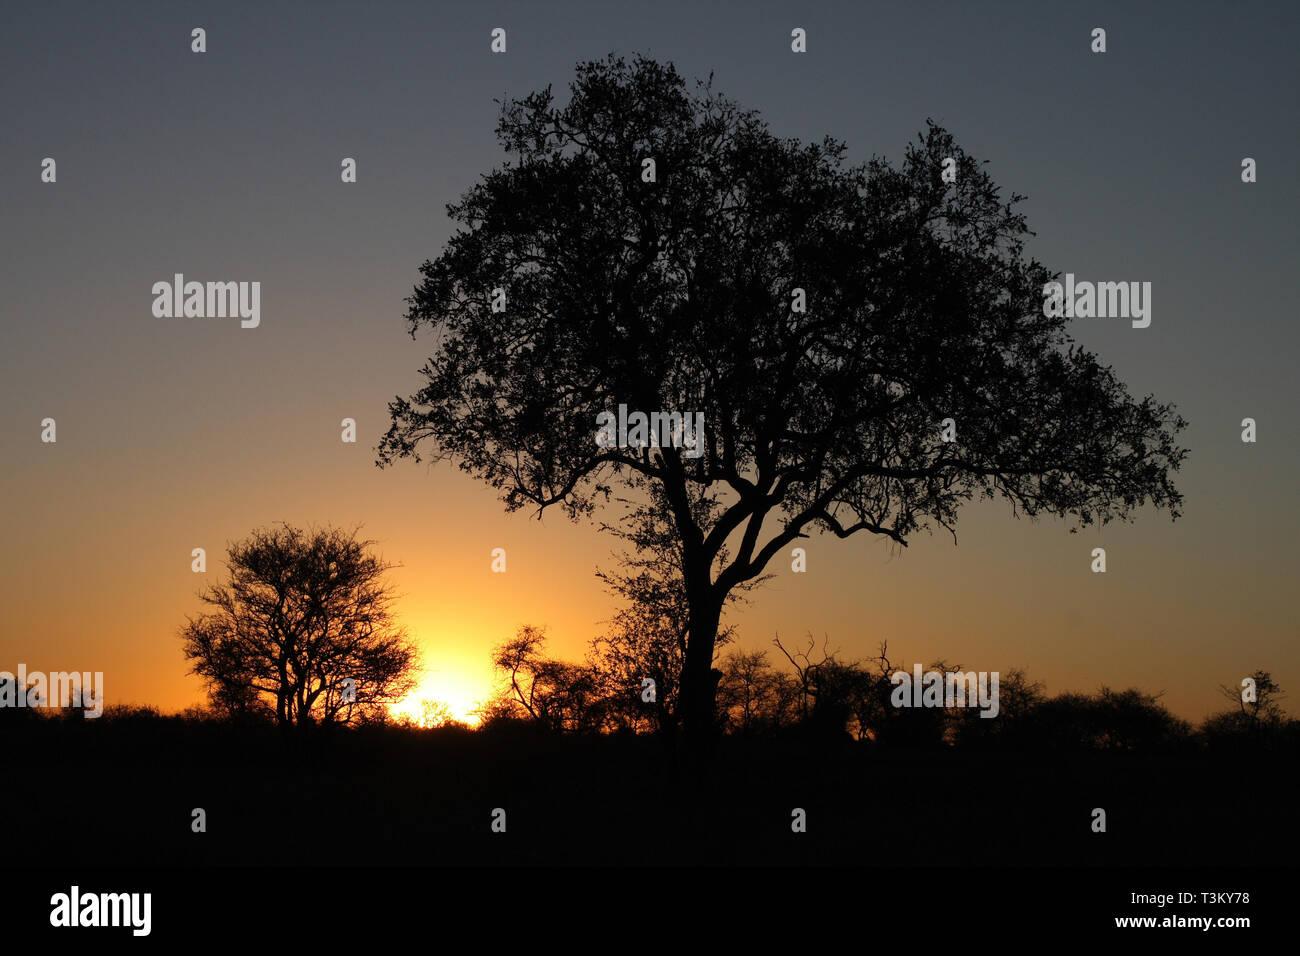 Sonnenuntergang Krüger Park Südafrika / Sundown Kruger Park South Africa / - Stock Image